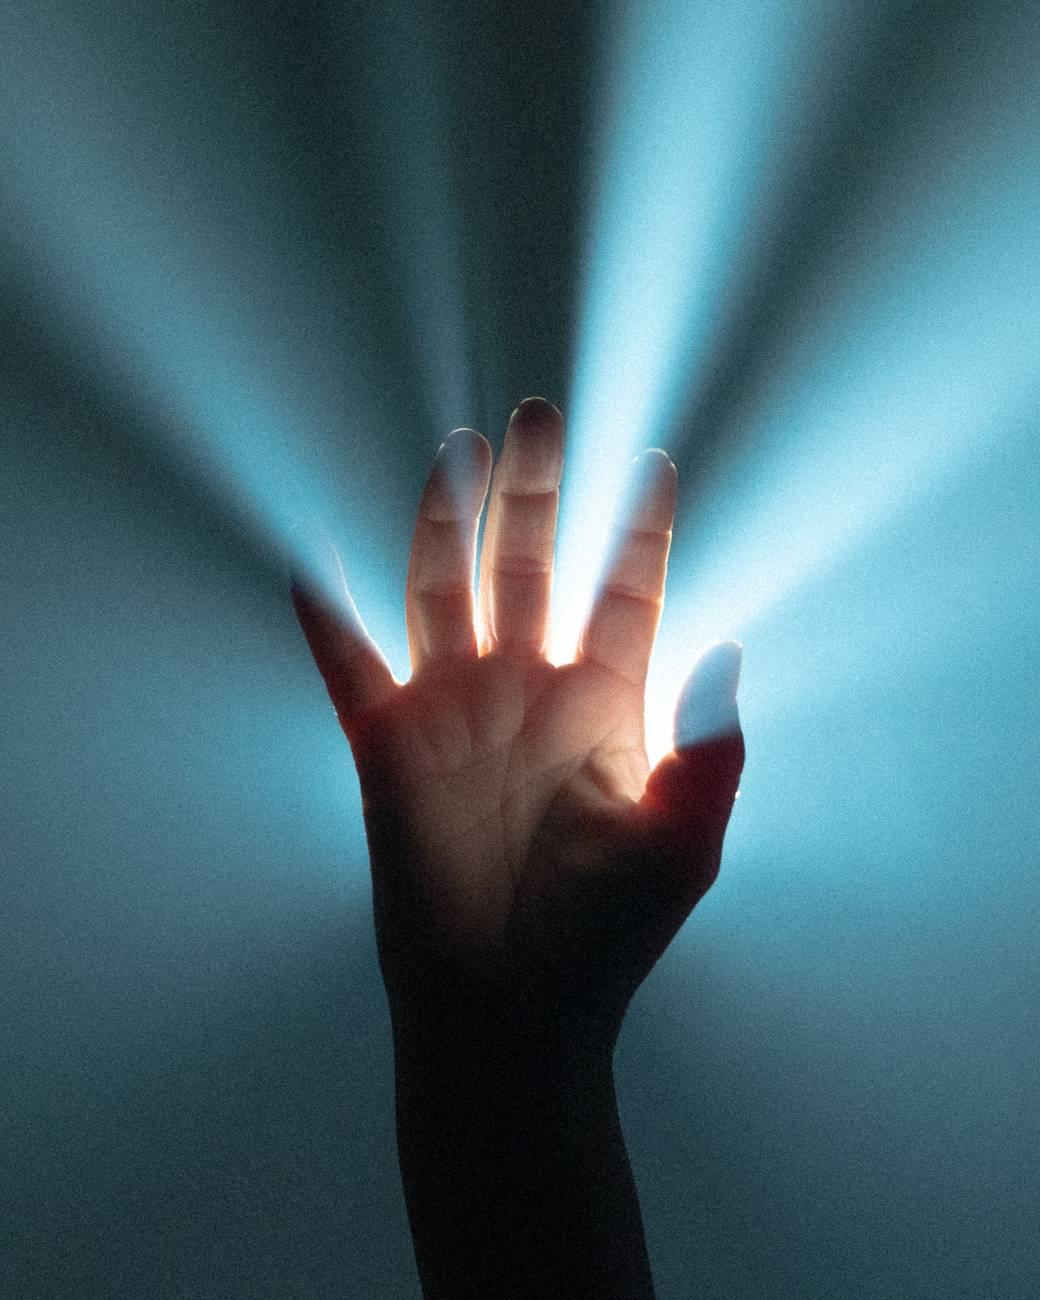 person s hand